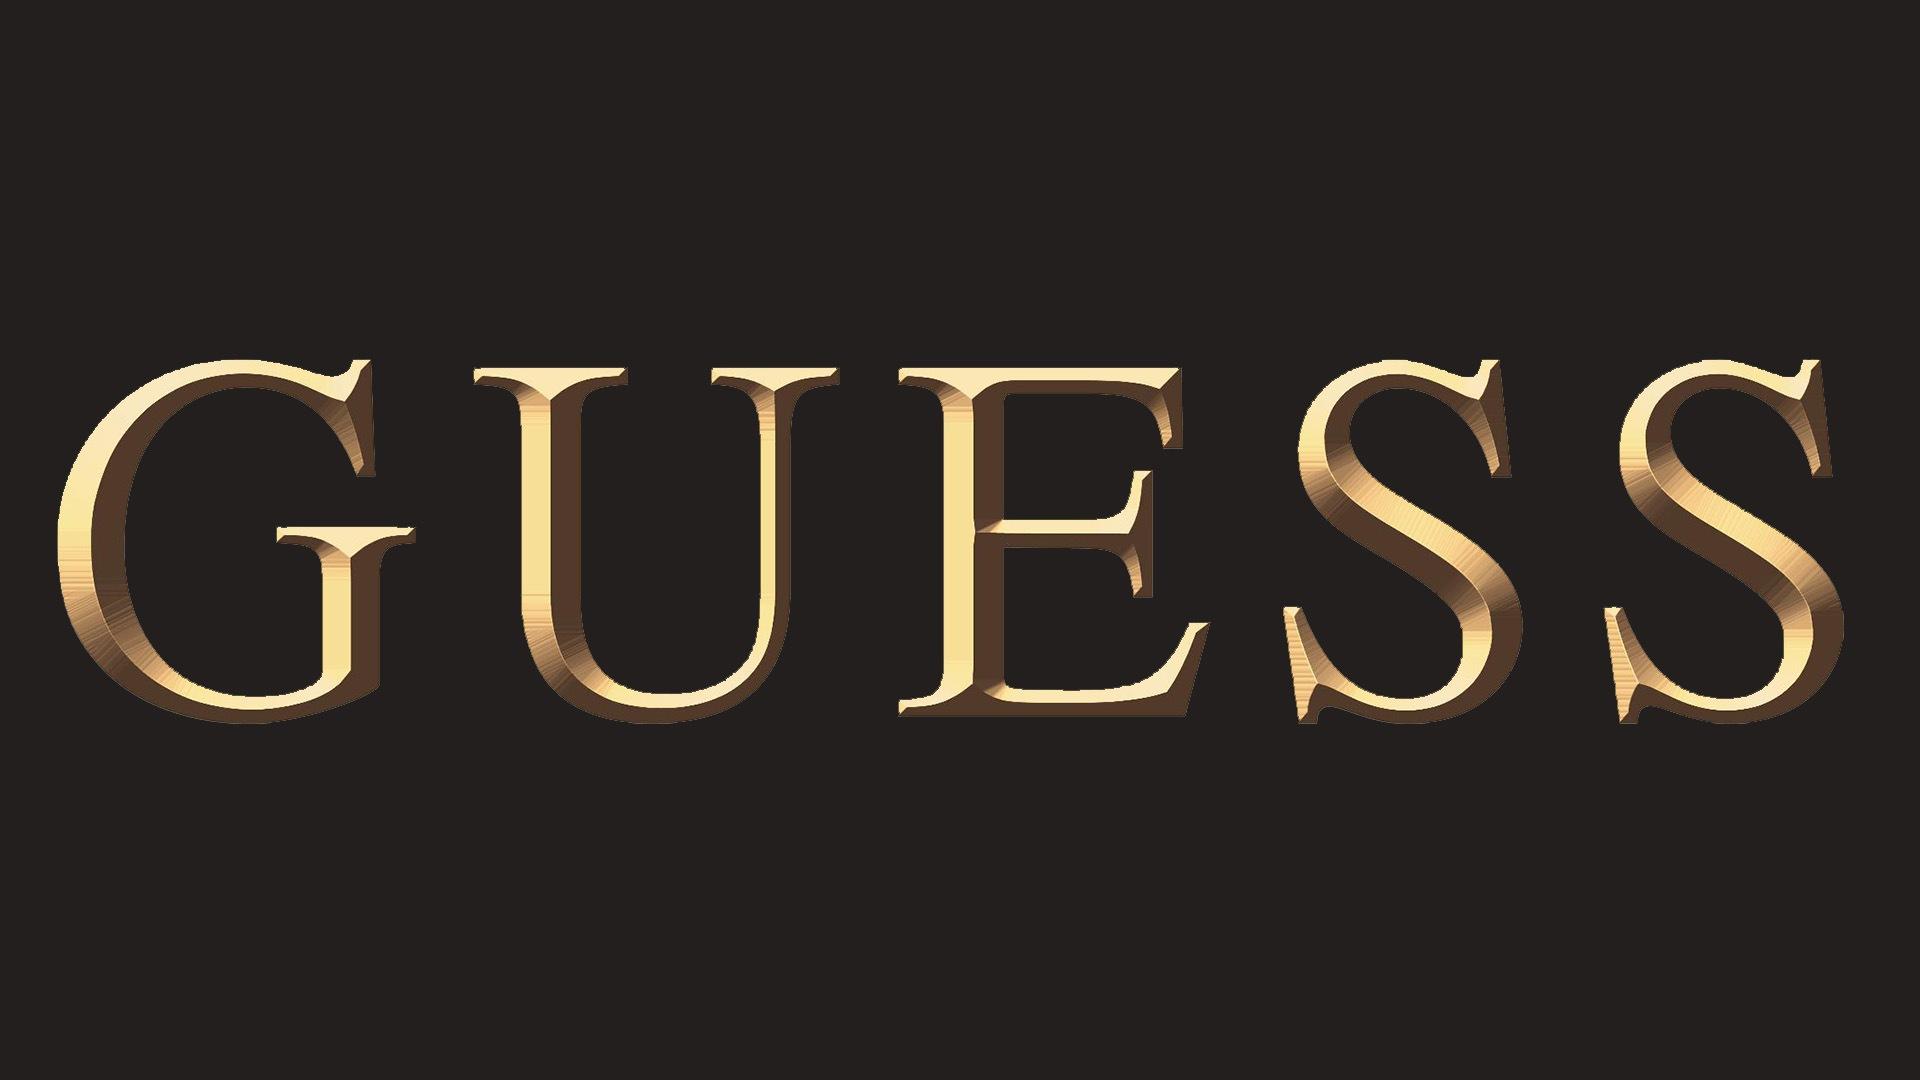 5ed806b4ef Guess logo histoire et signification, evolution, symbole Guess